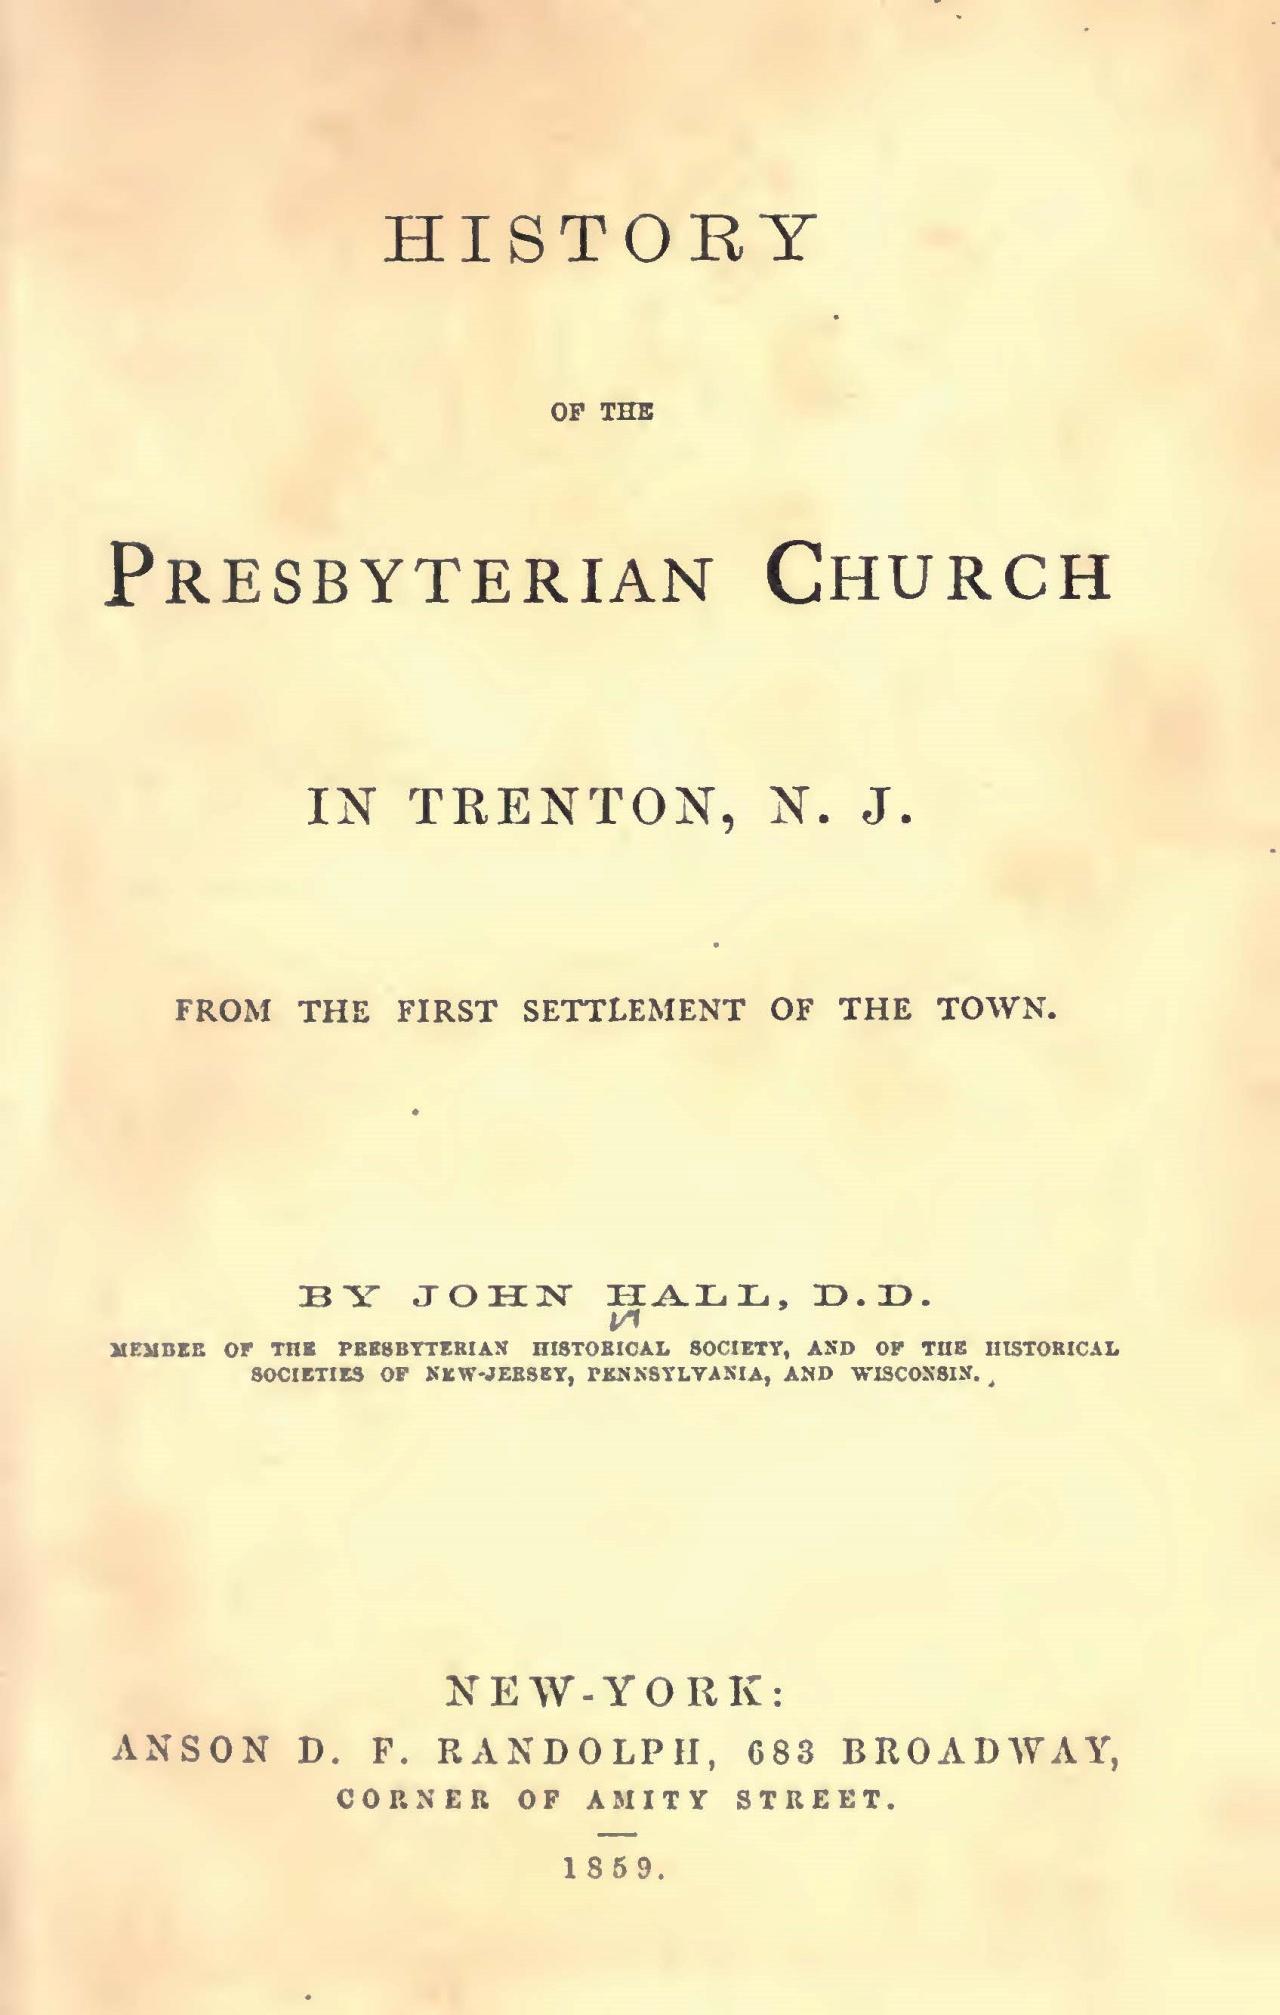 Hall, John, History of the Presbyterian Church in Trenton, N.J. Title Page.jpg